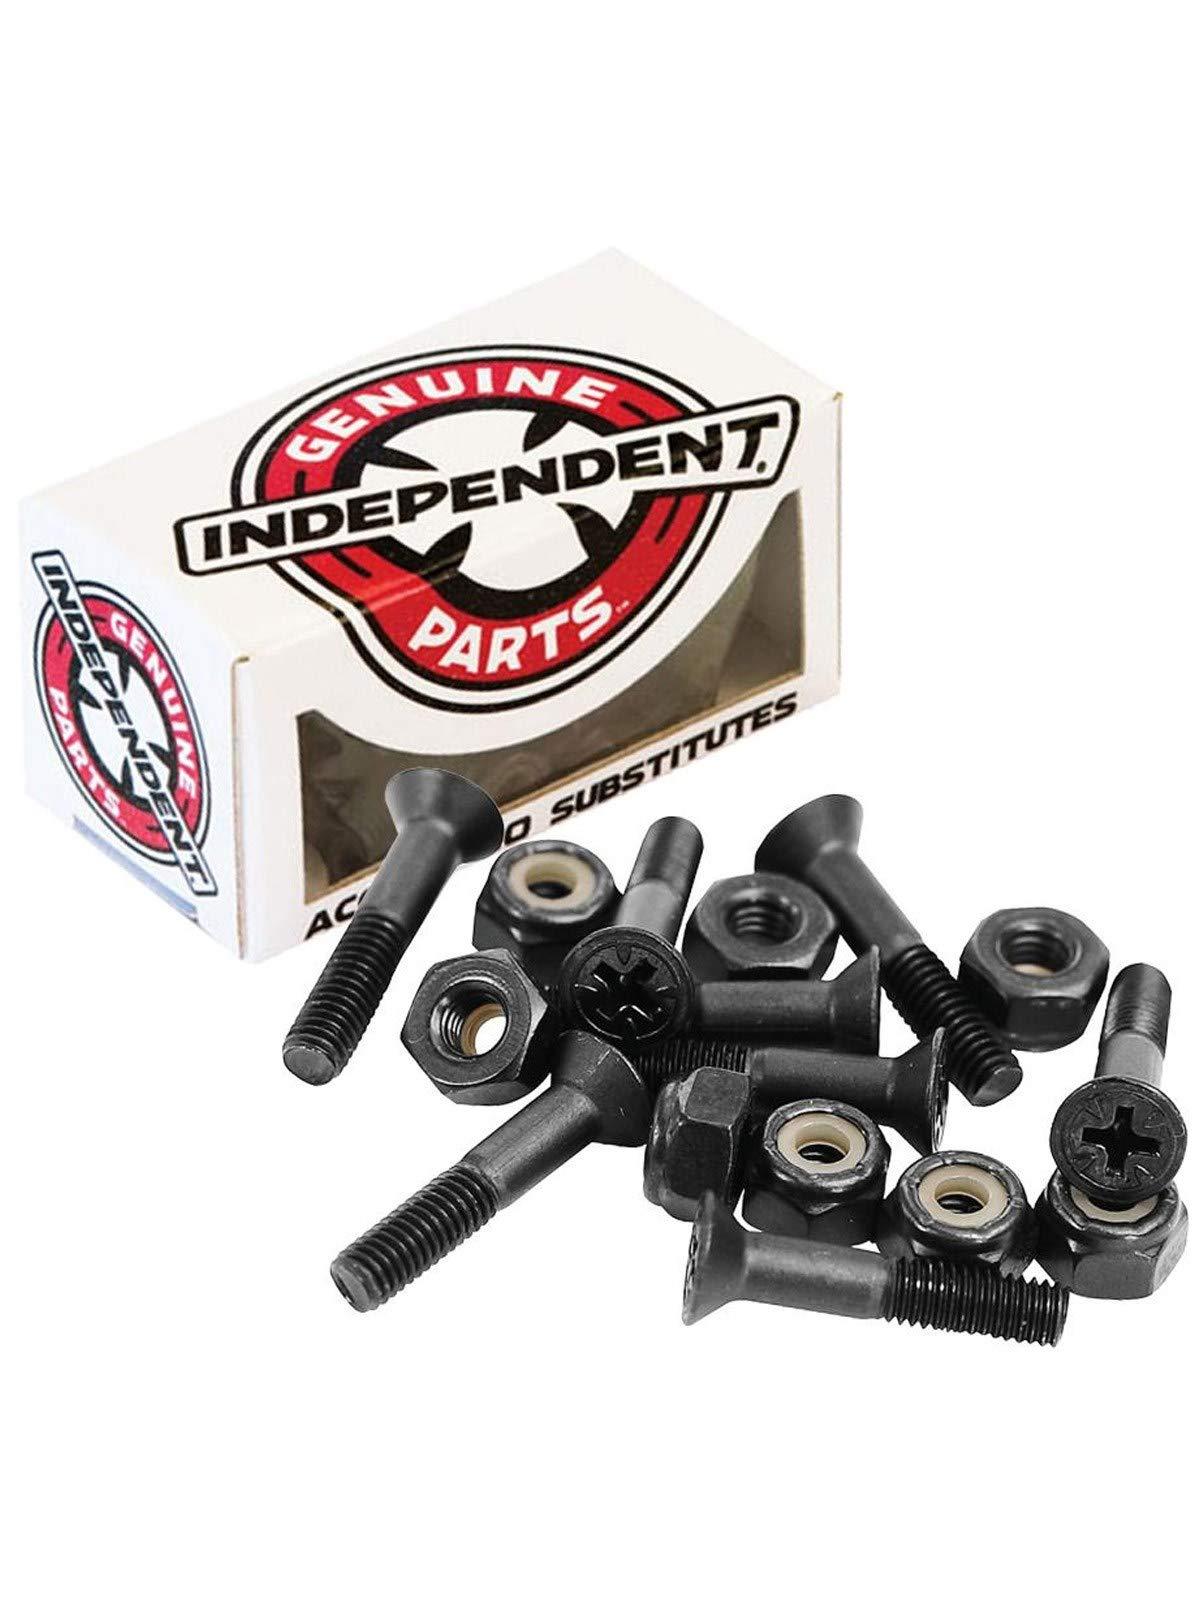 Independent Genuine Parts Cross Bolts Standard Phillips Skateboard Hardware (Black/Black, 1'') by Independent (Image #1)